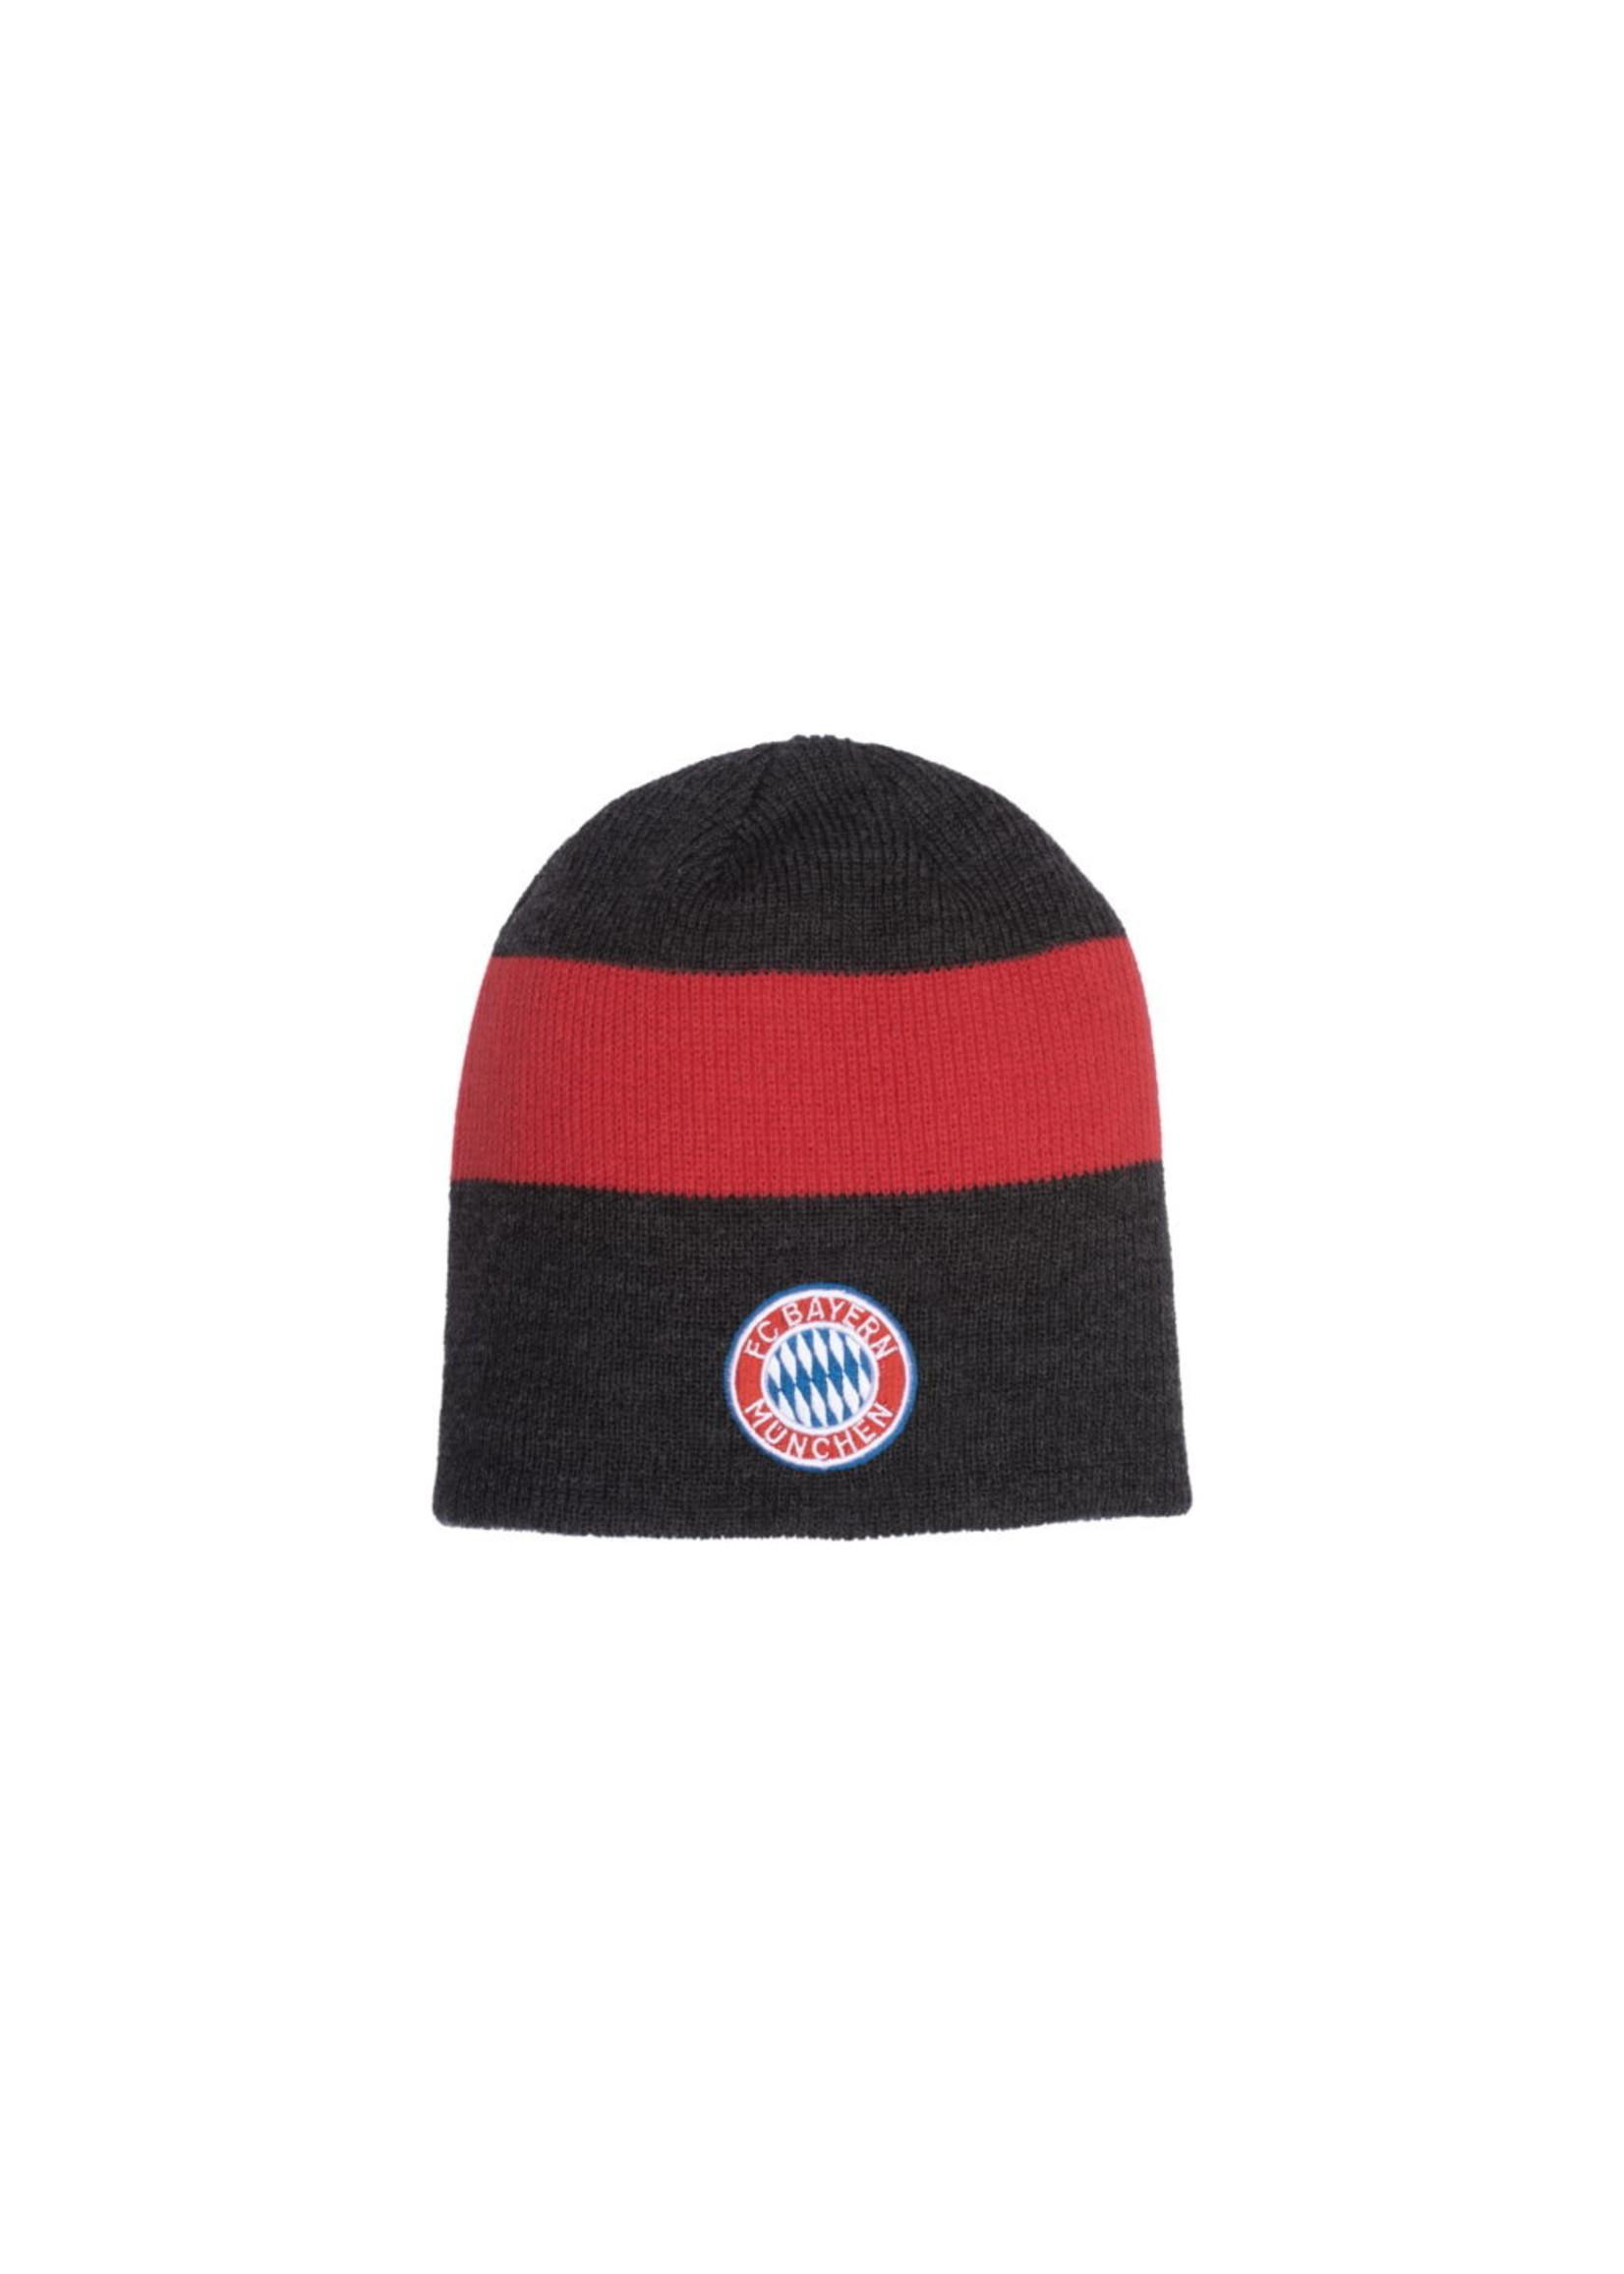 Bayern Munich Fury Knit Beanie